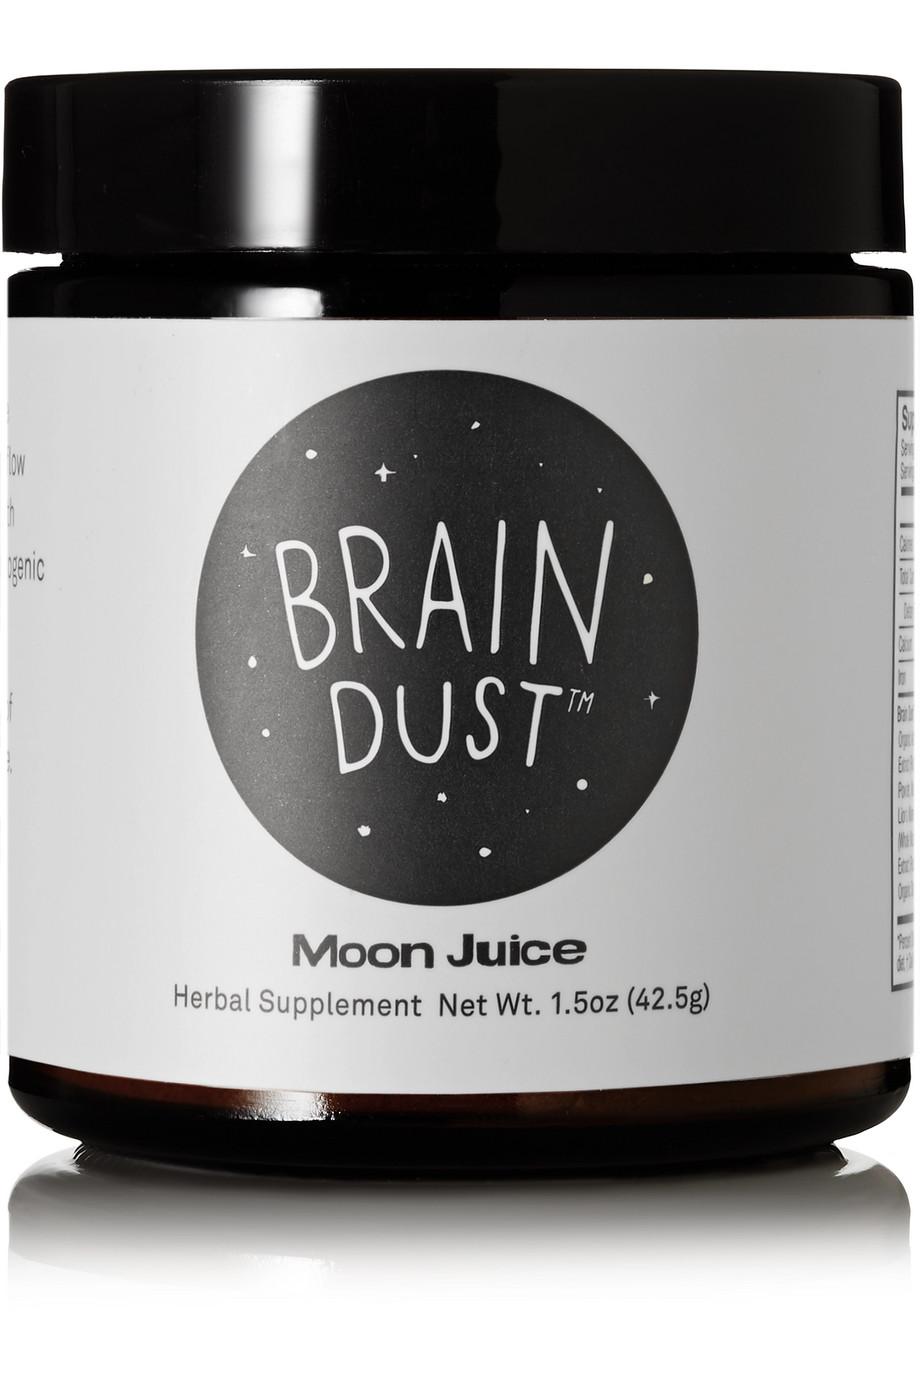 Beauty Shroom Exfoliating Acid Potion by moon juice #14